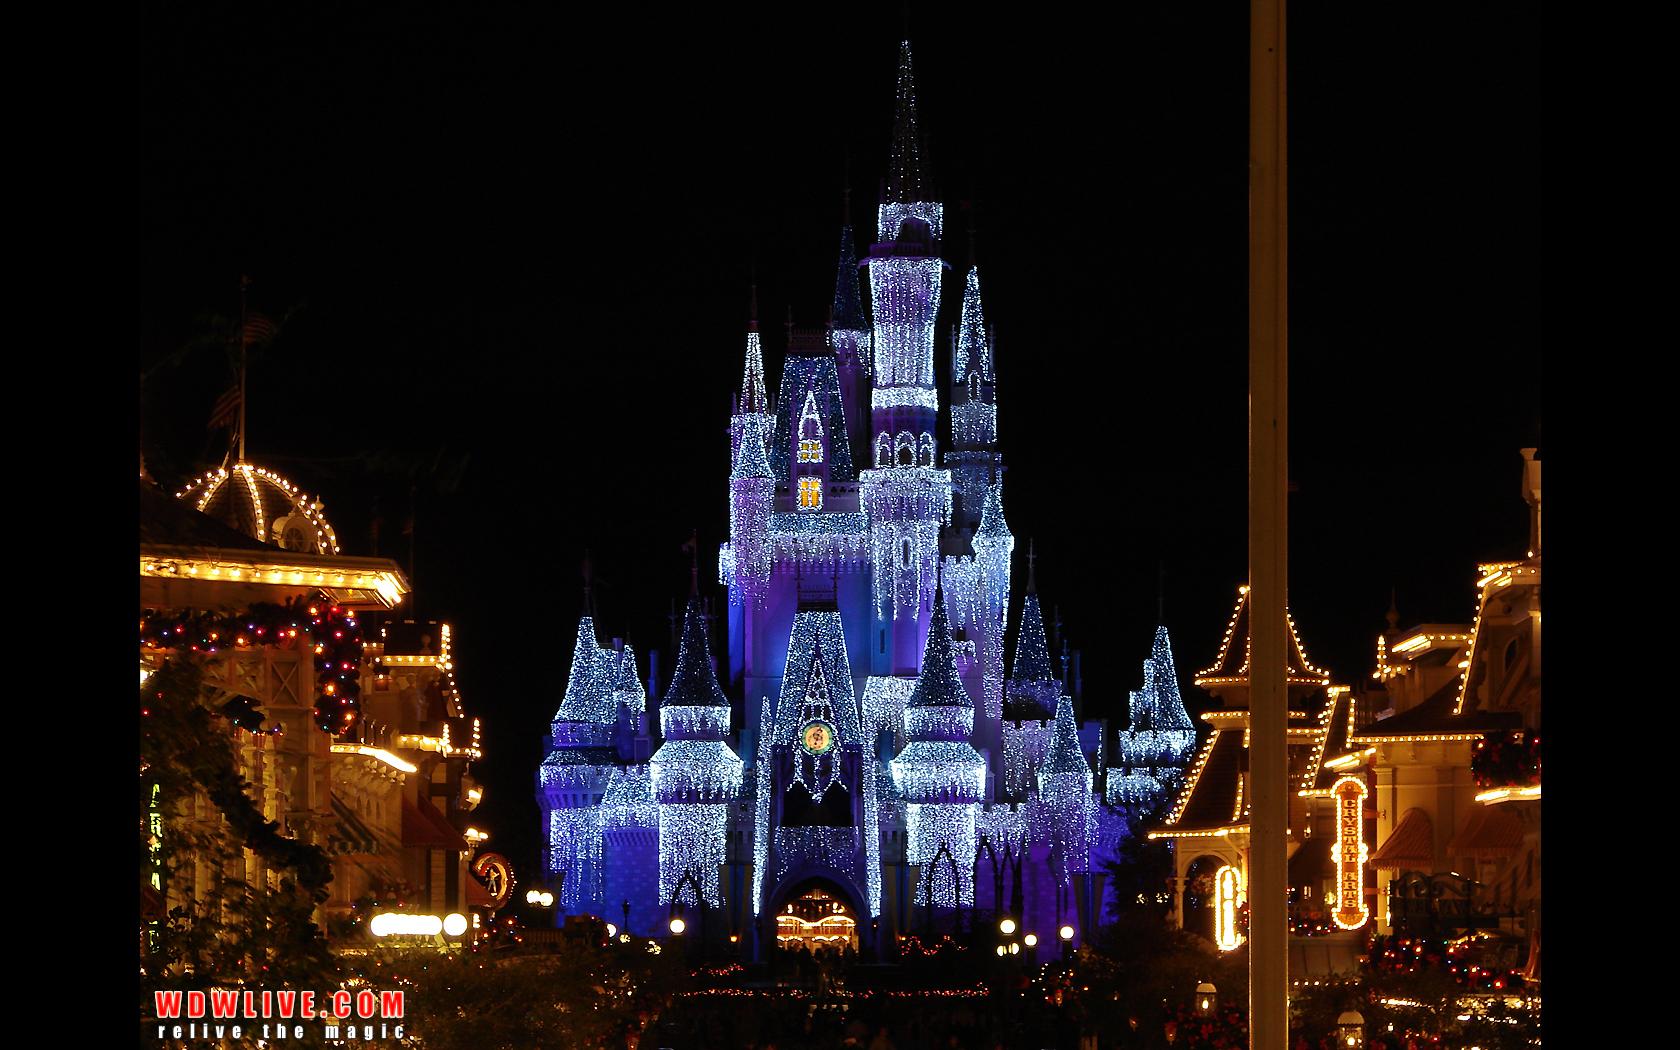 Cinderella Castle Desktop Wallpaper 1680x1050 1680x1050